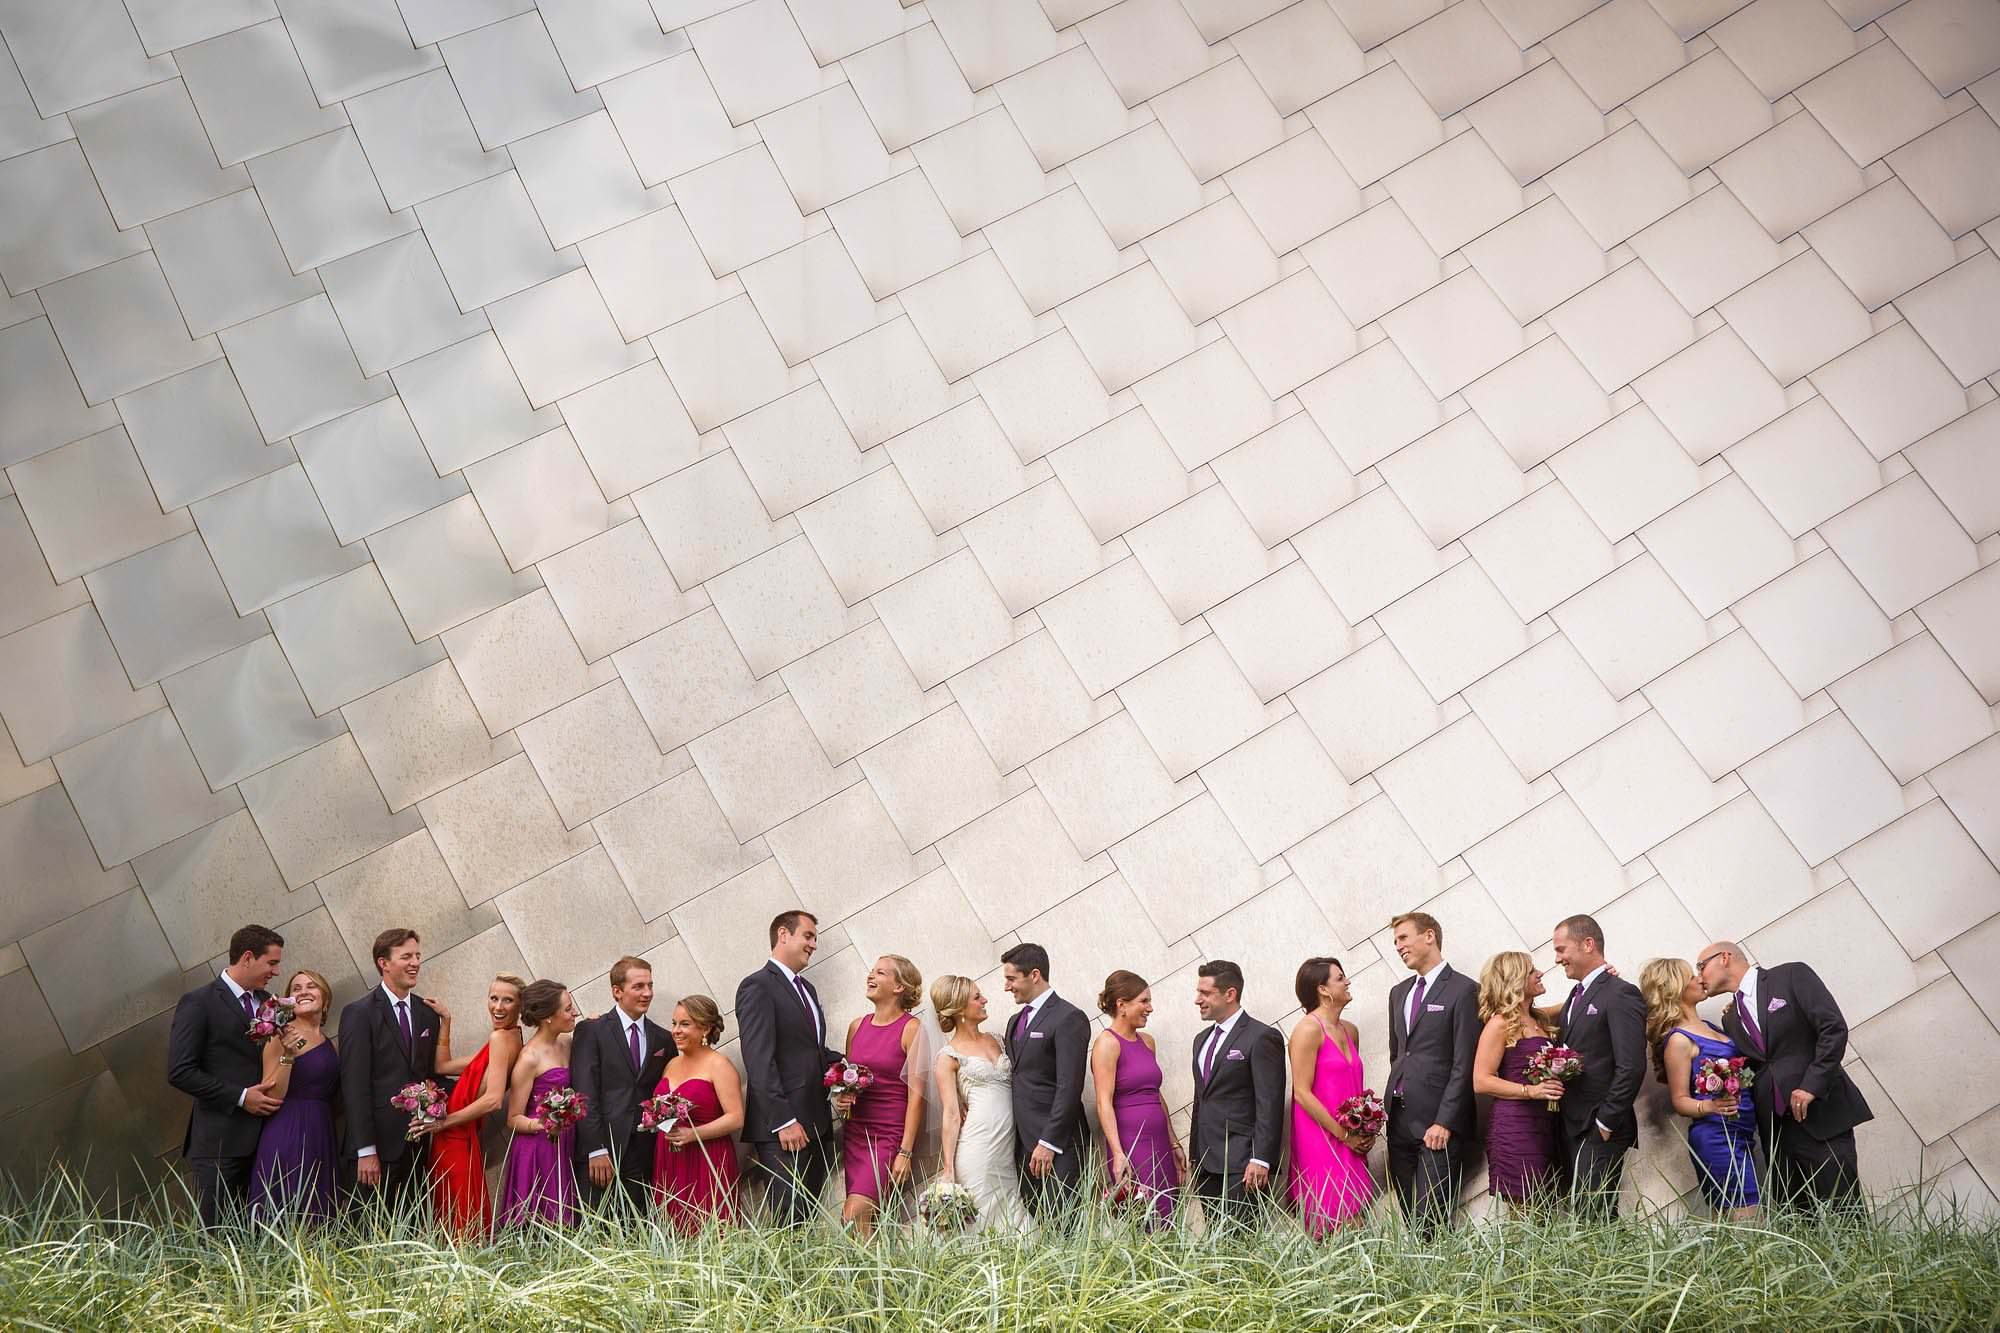 006-case-western-cleveland-wedding-photographer-genevieve-nisly-photography